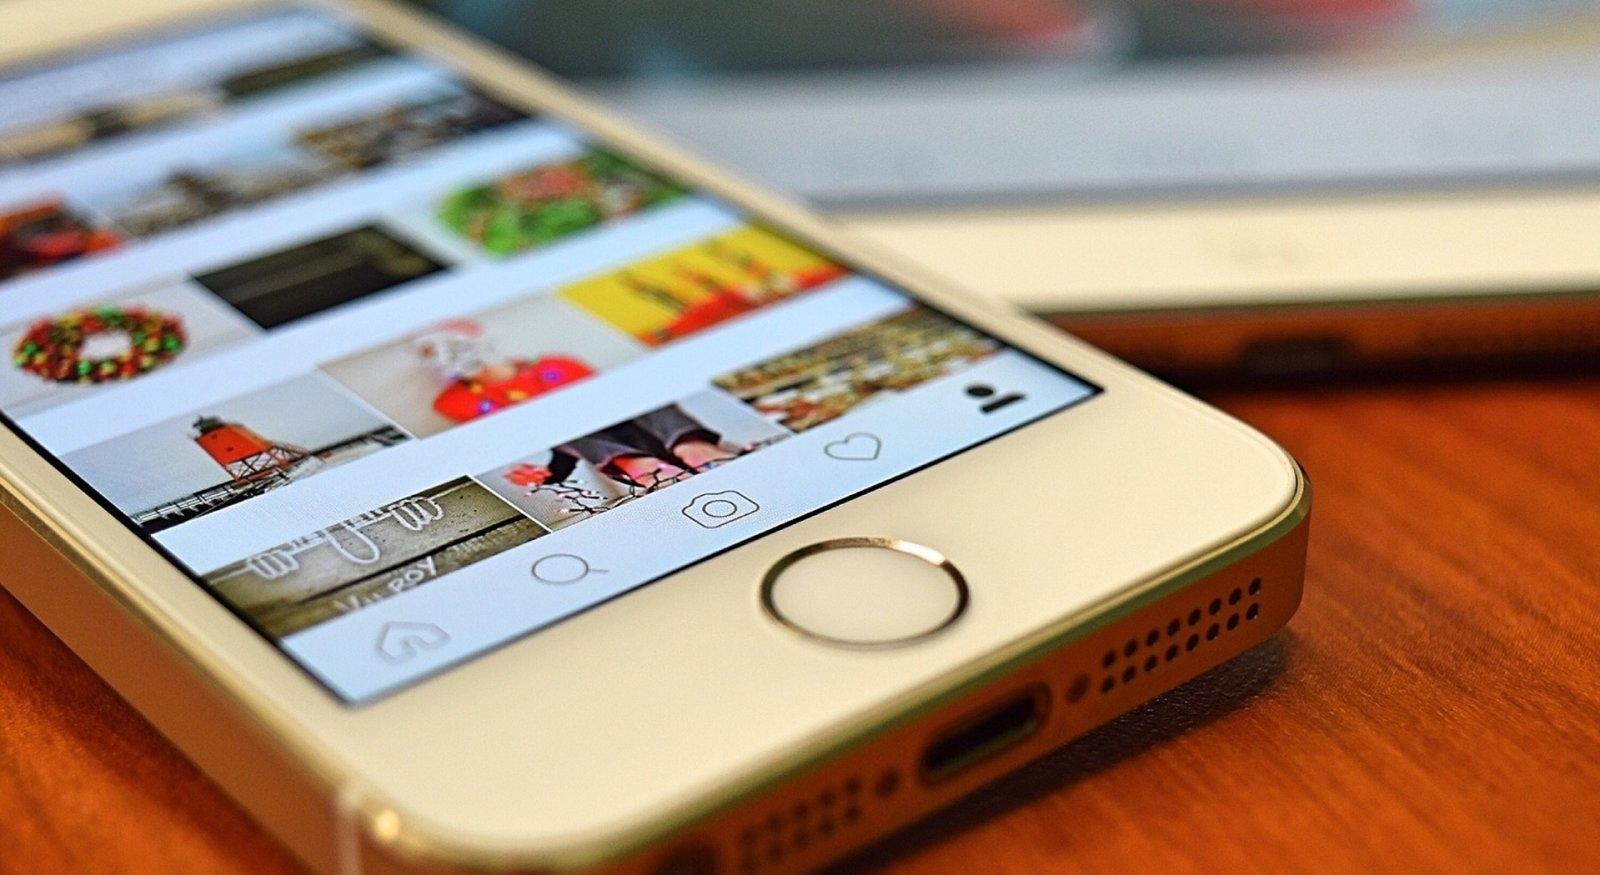 Instagram's 'follows you' feature reveals your true friends | DeviceDaily.com